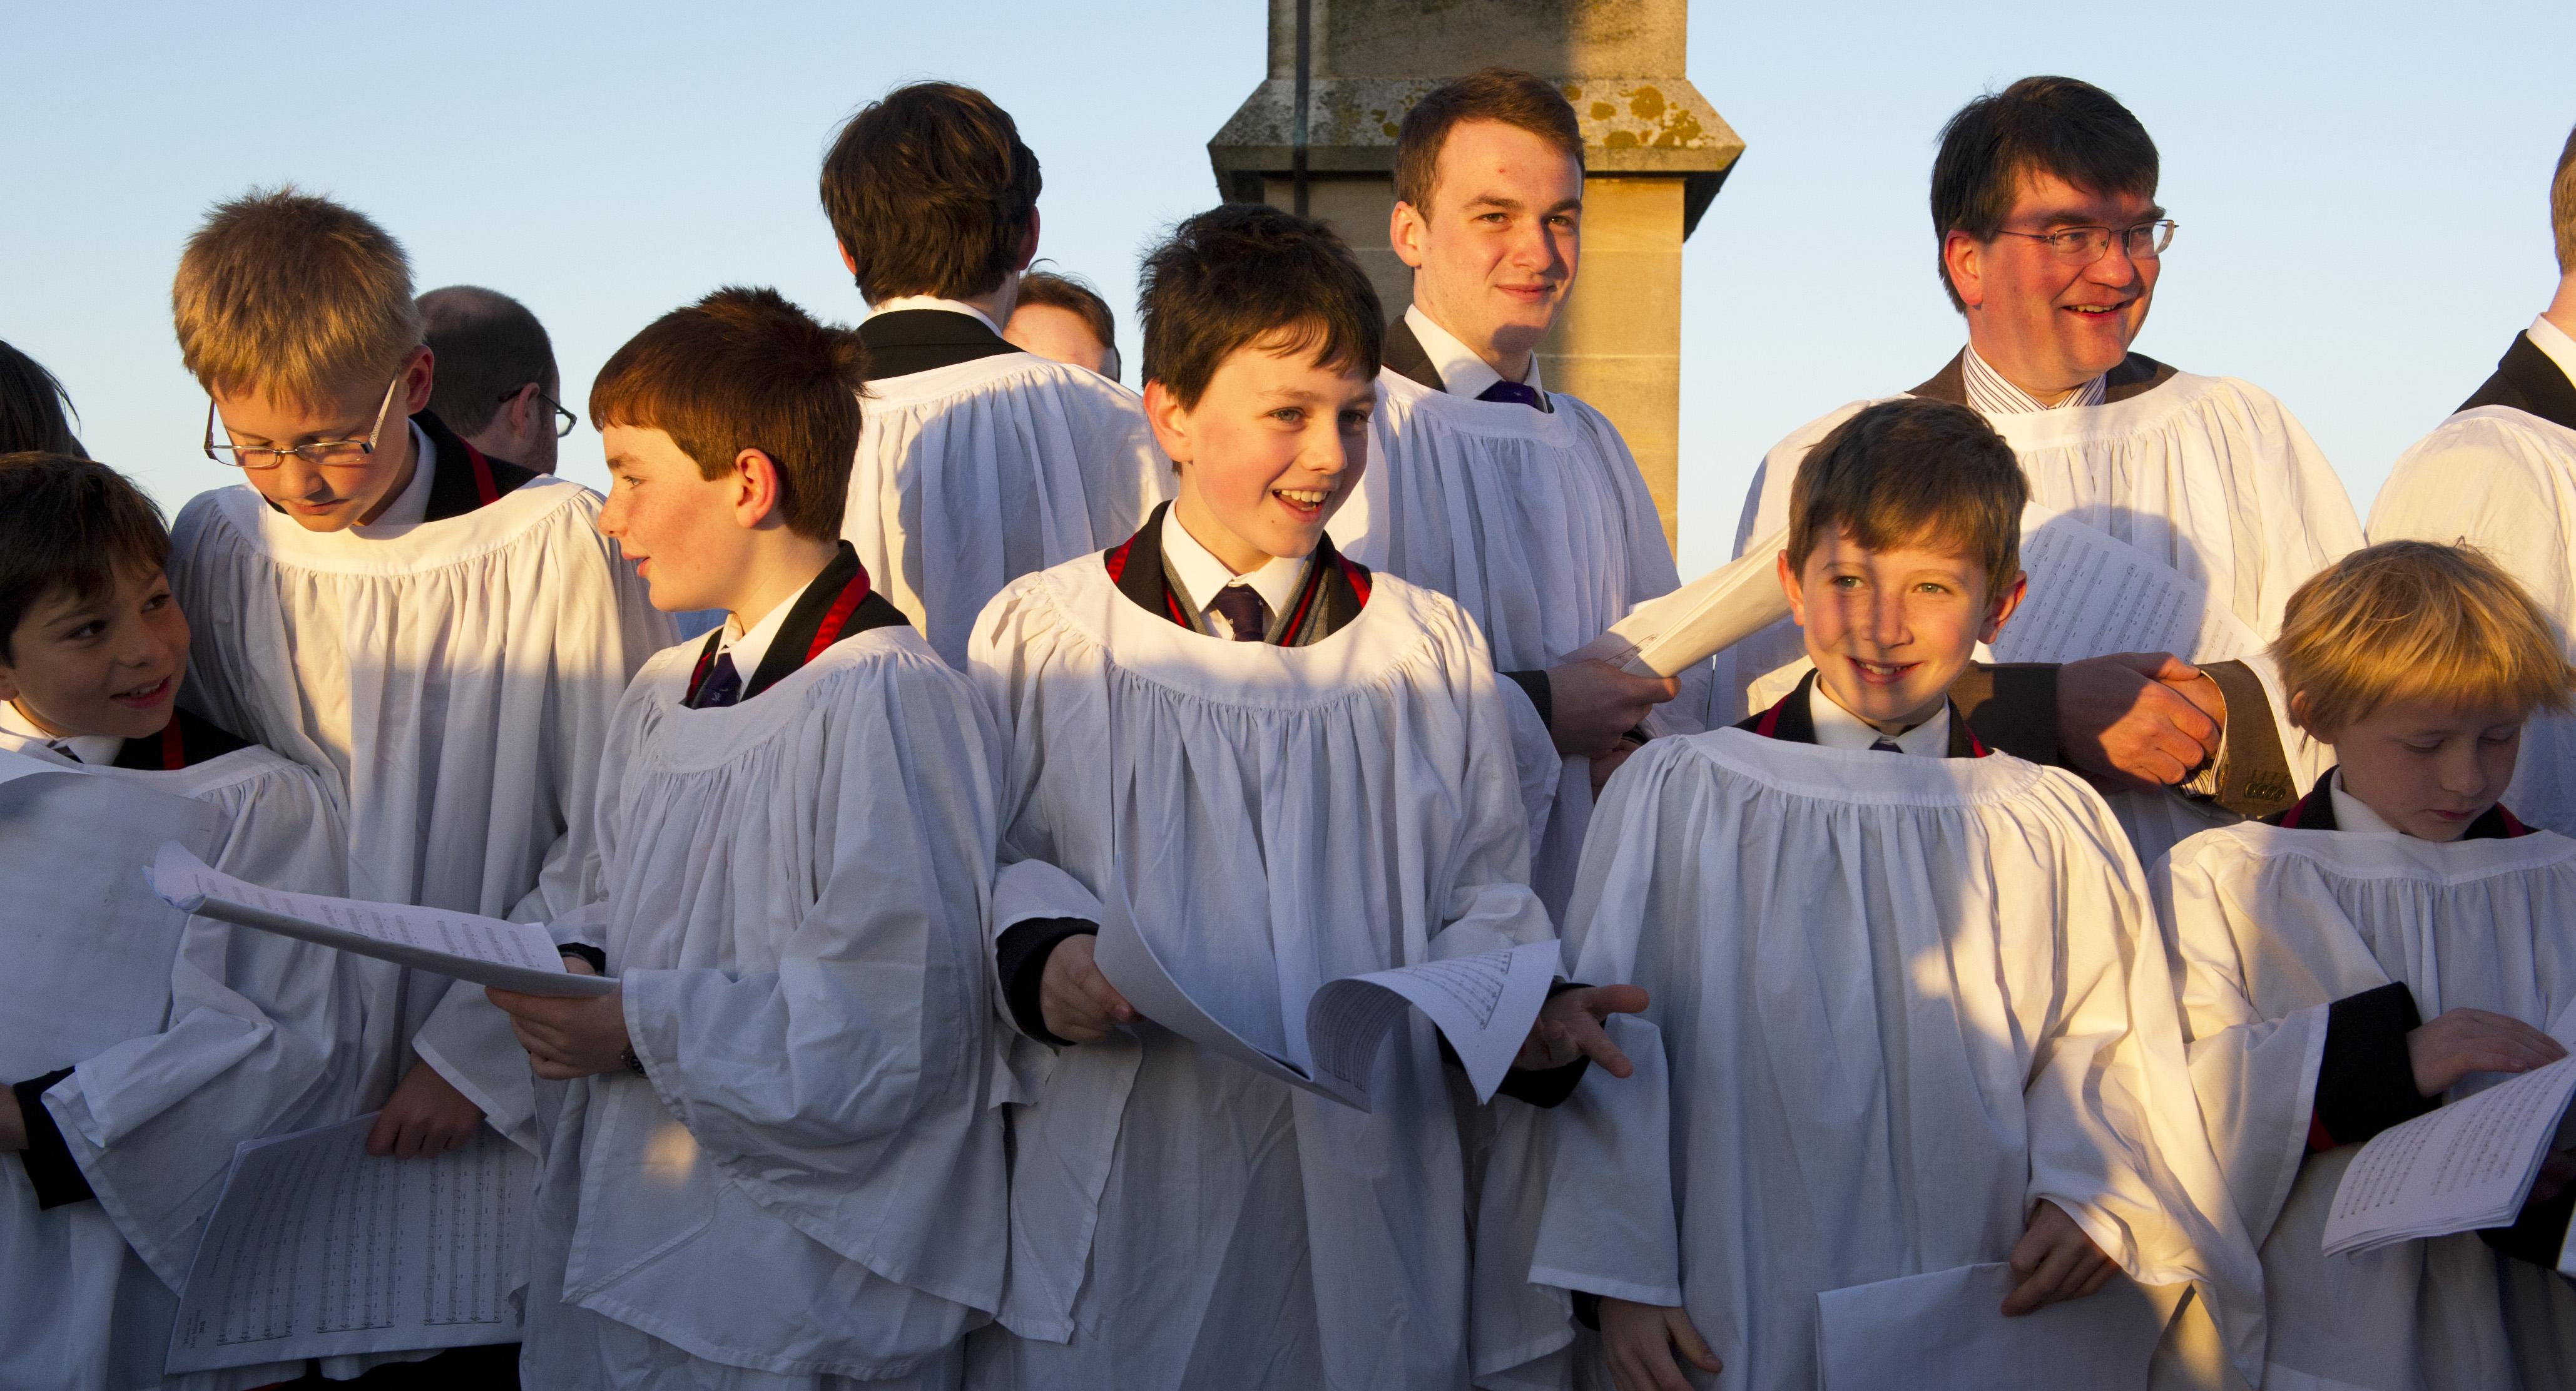 Magdalen College Choir